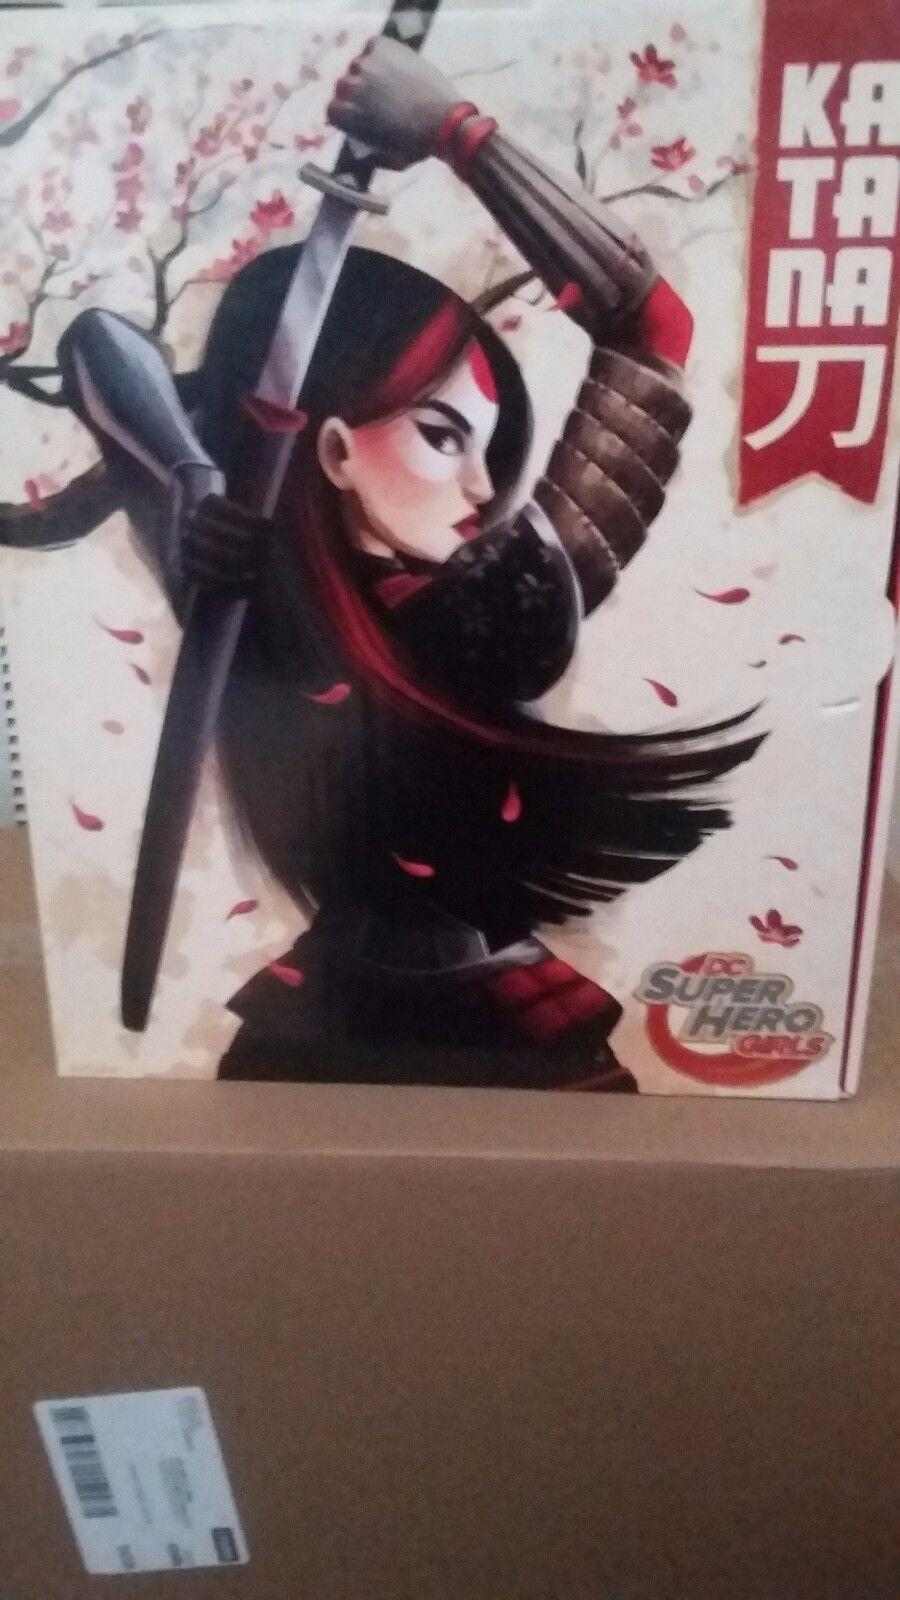 DC Super Hero Girls Katana EX  12   cifra nuovo  Ship US  salutare